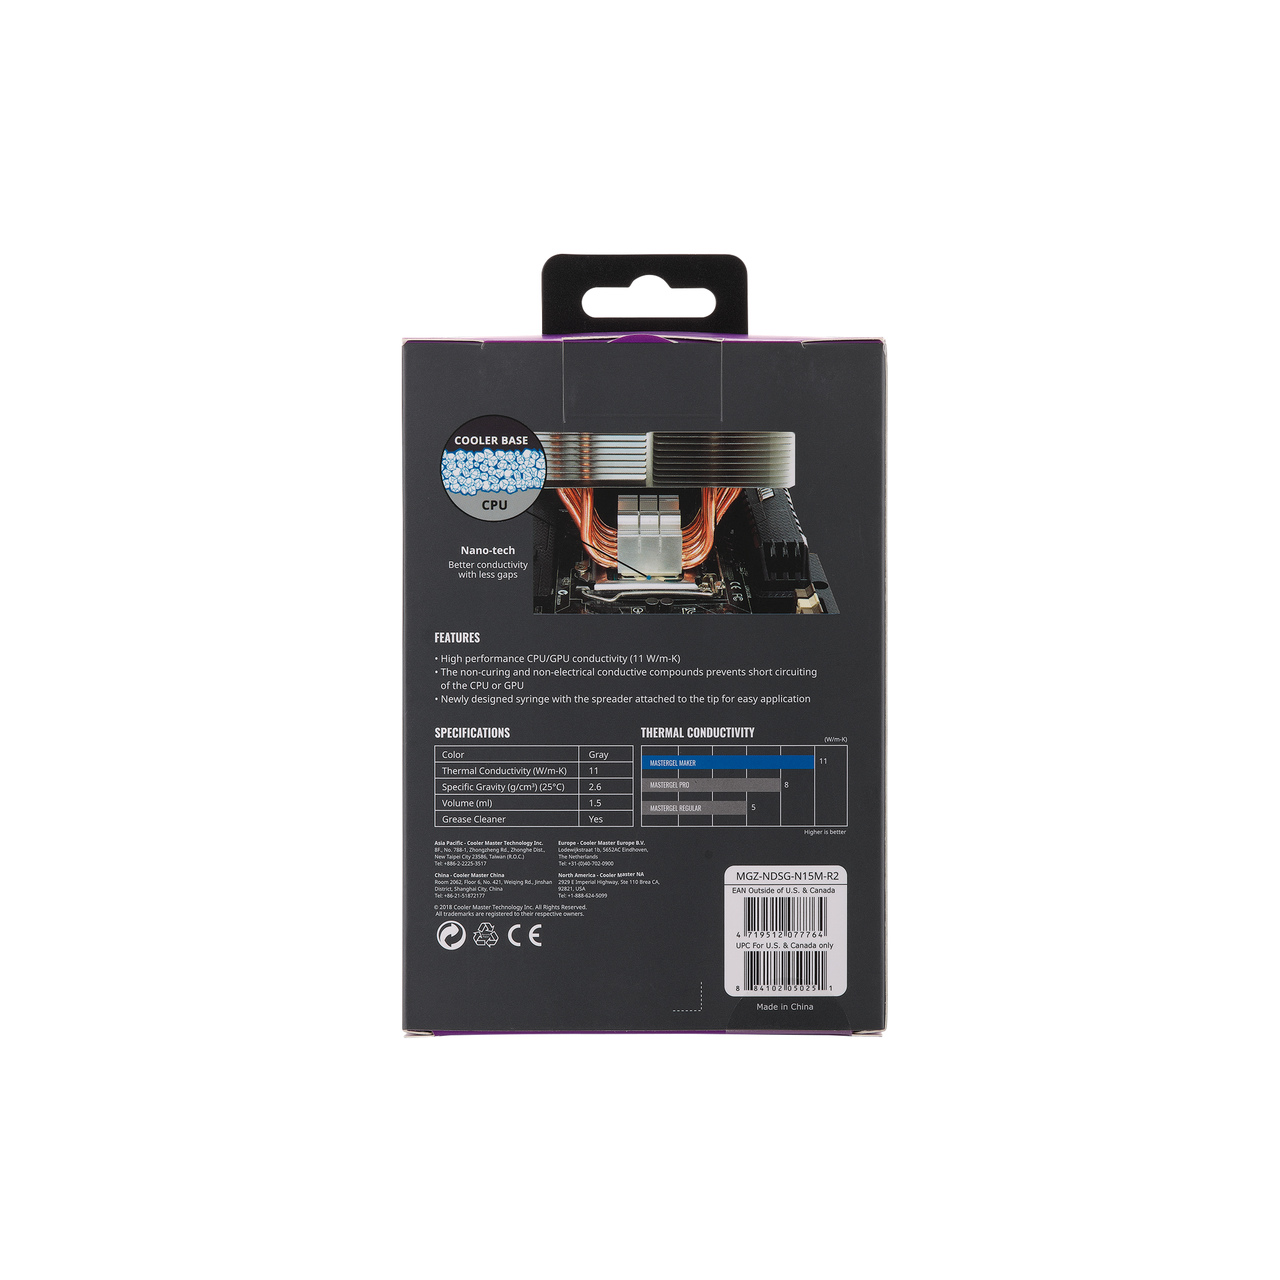 Pasta Térmica Cooler Master Gel Maker Nano, MGZ-NDSG-N15M-R2